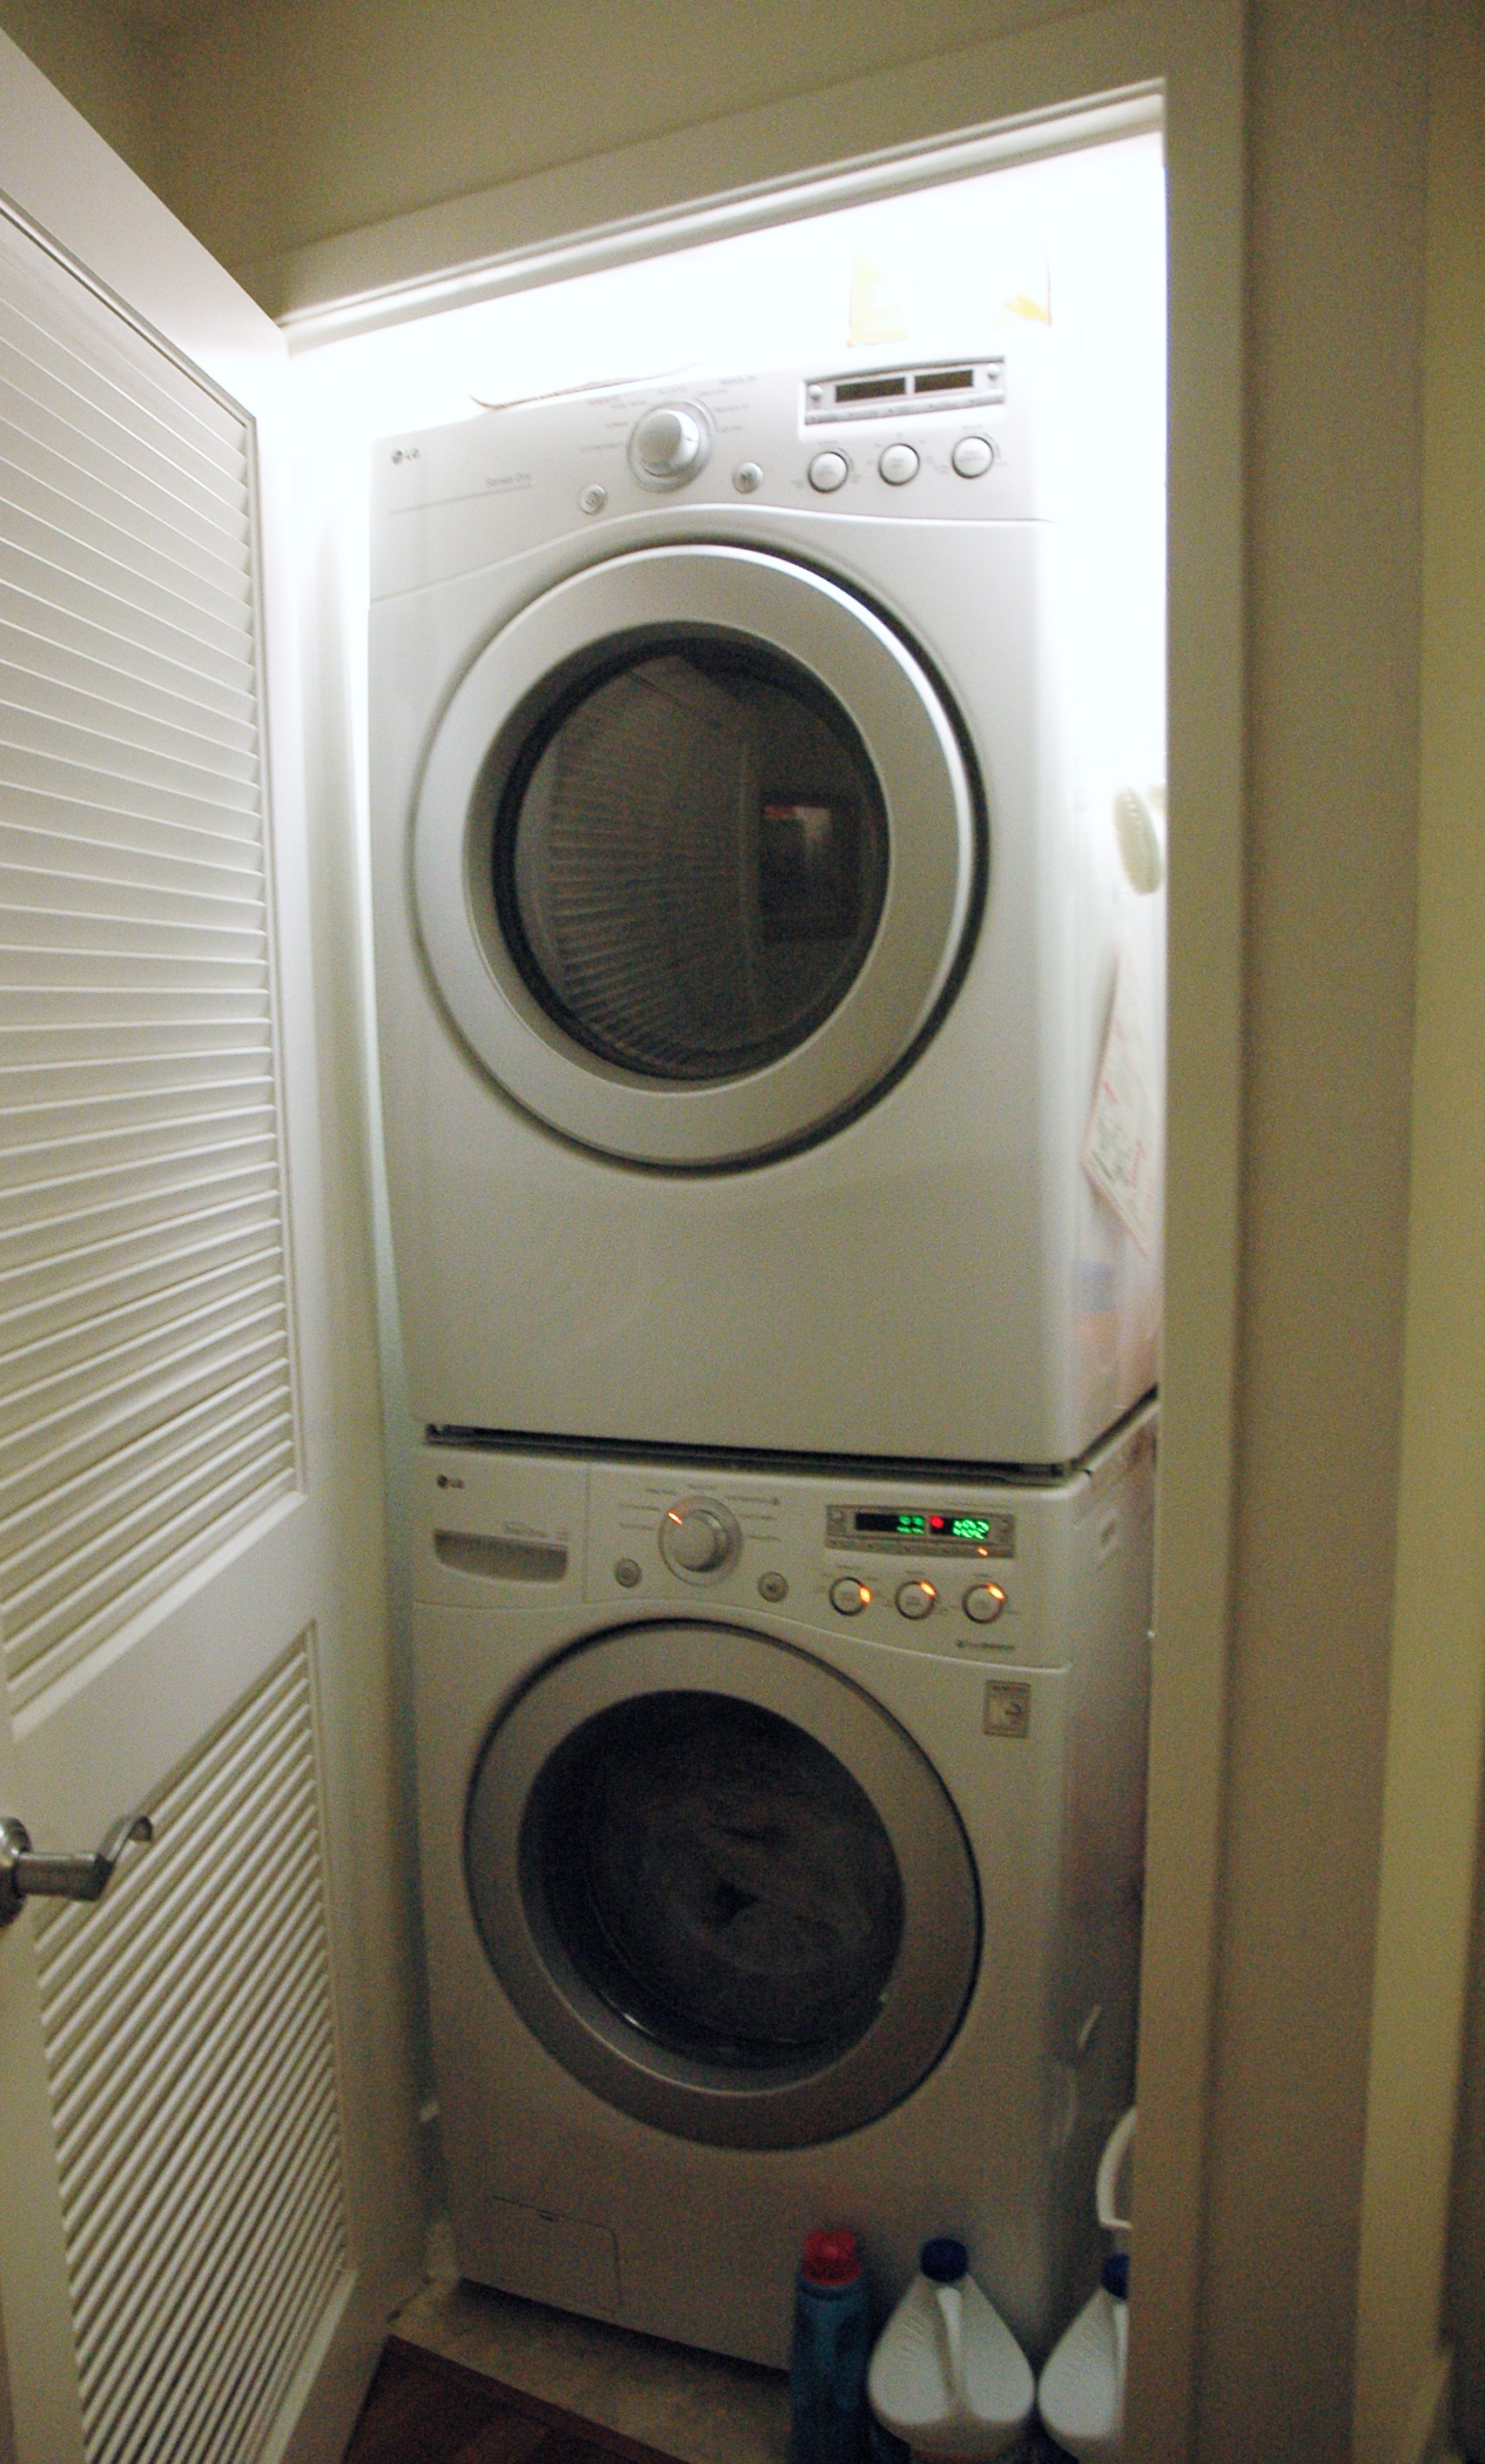 211-laundry_edited-1_7269532810_o.jpg